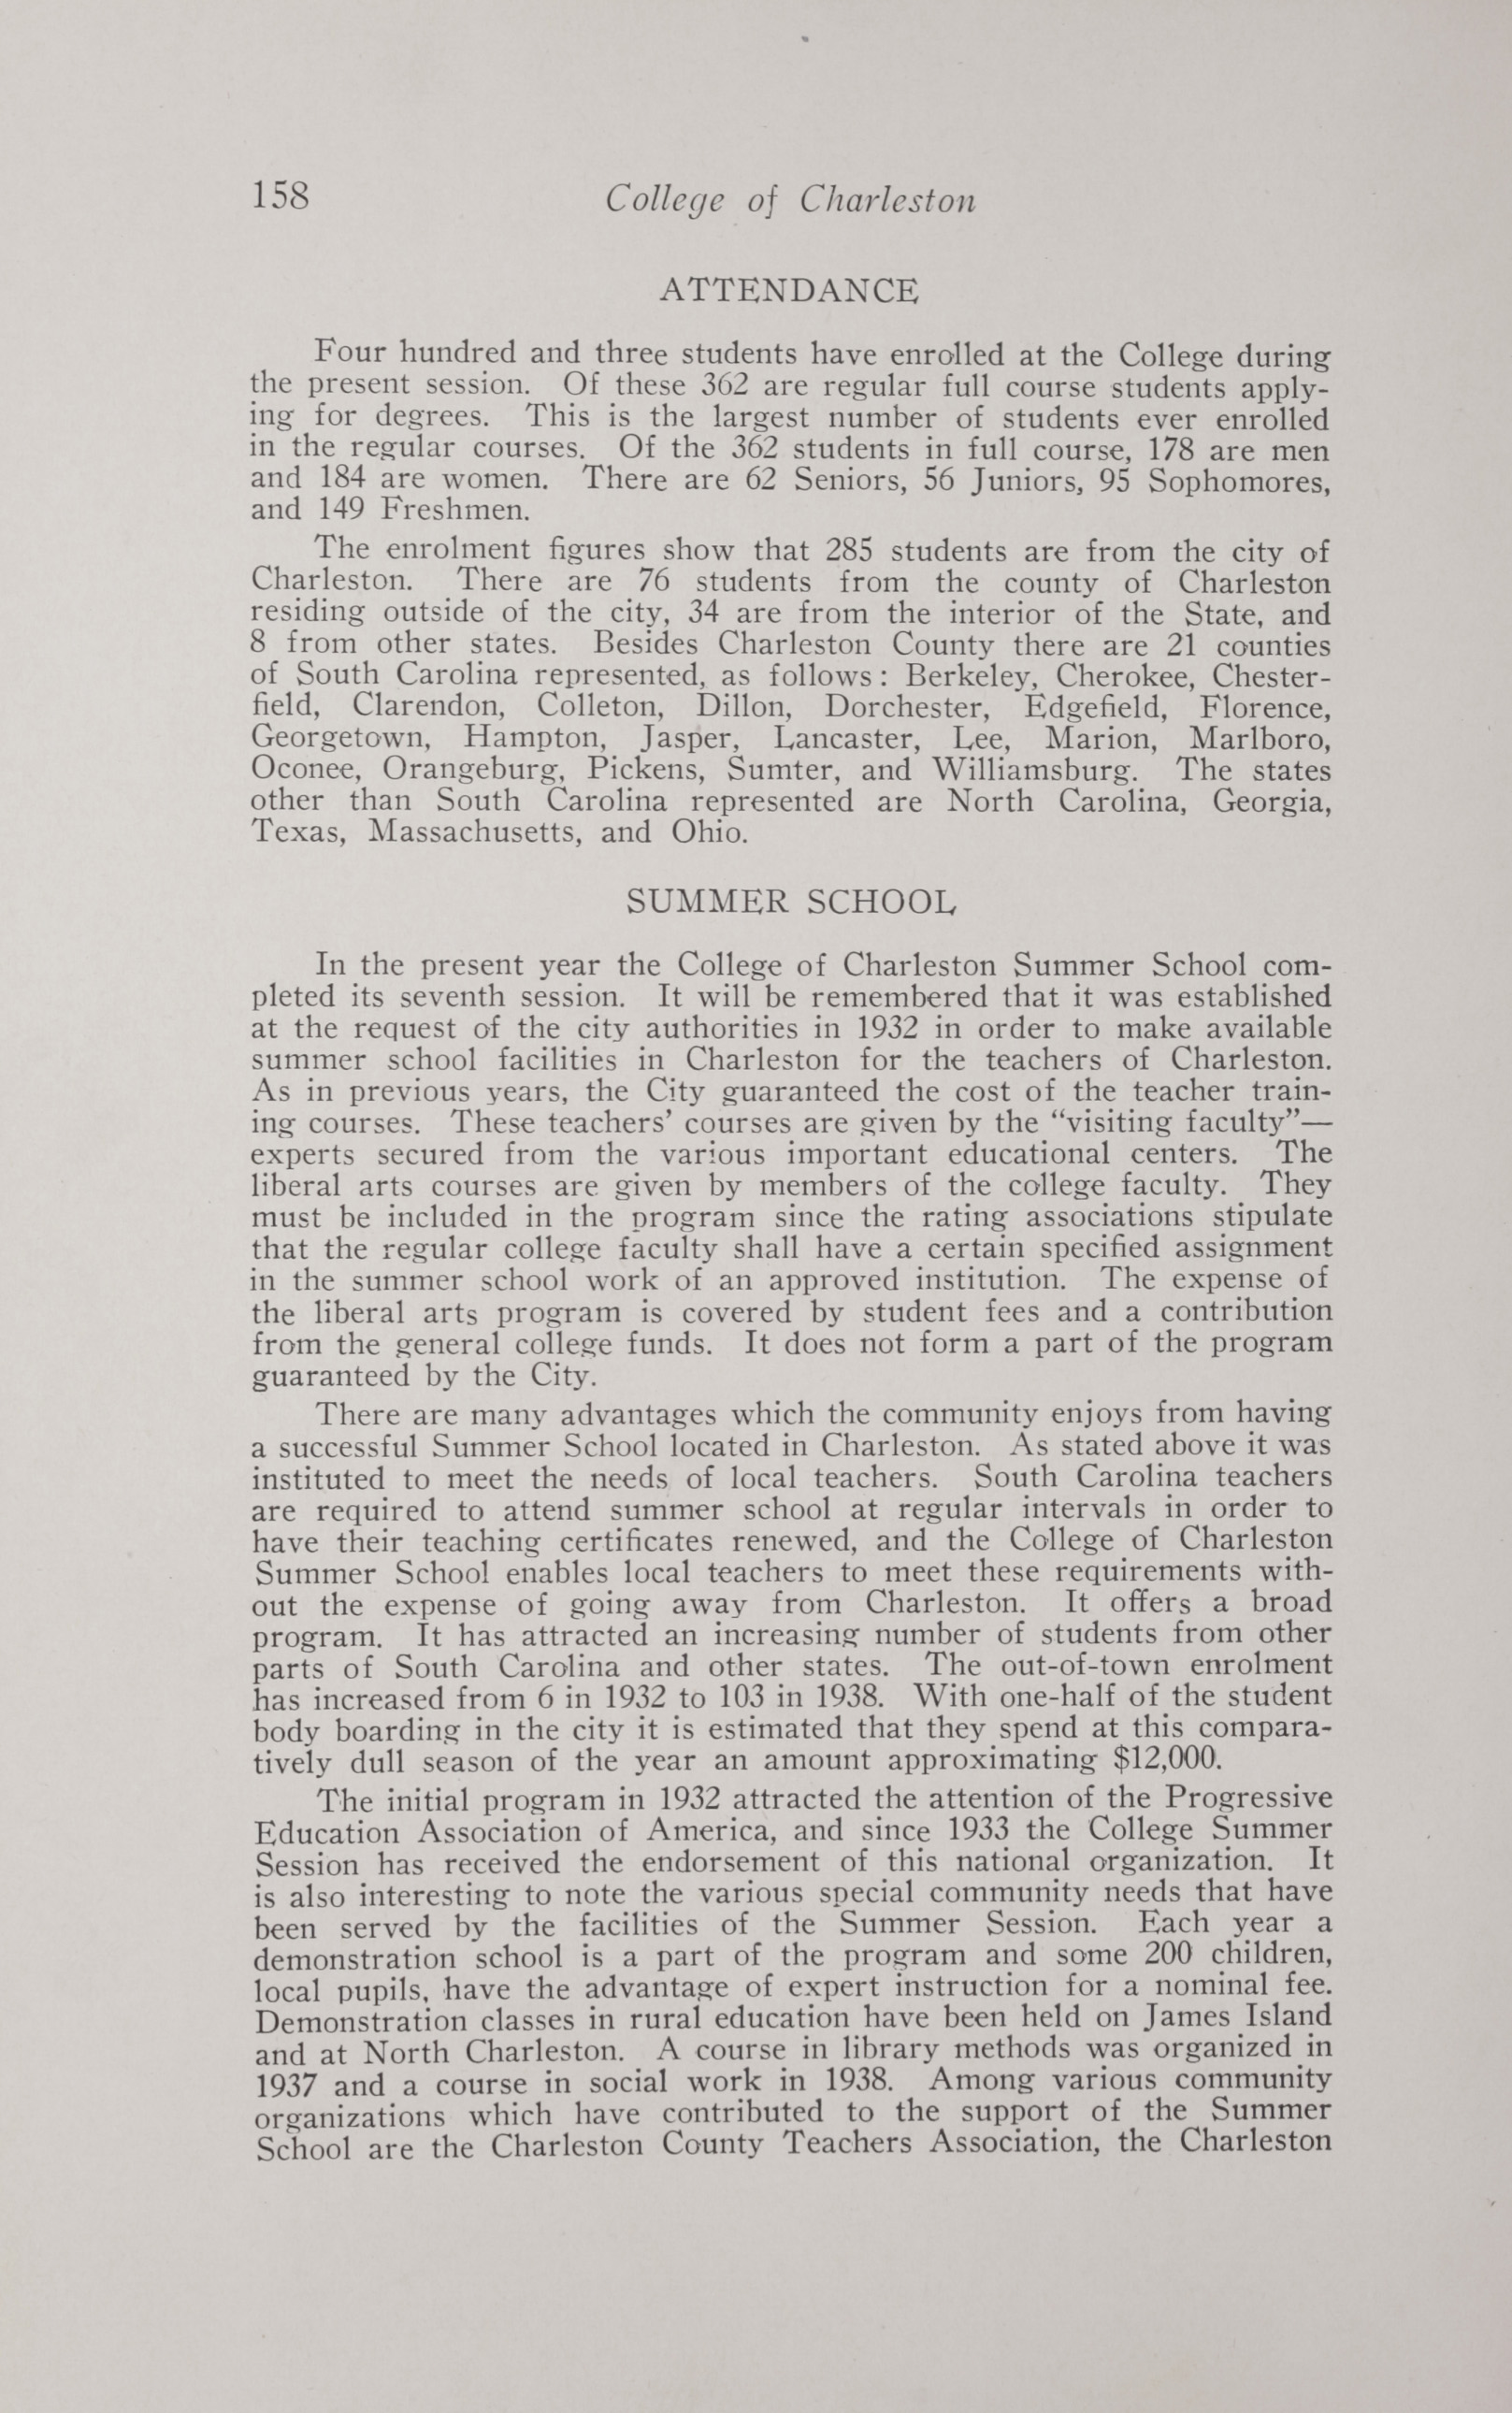 Charleston Yearbook, 1938, page 158